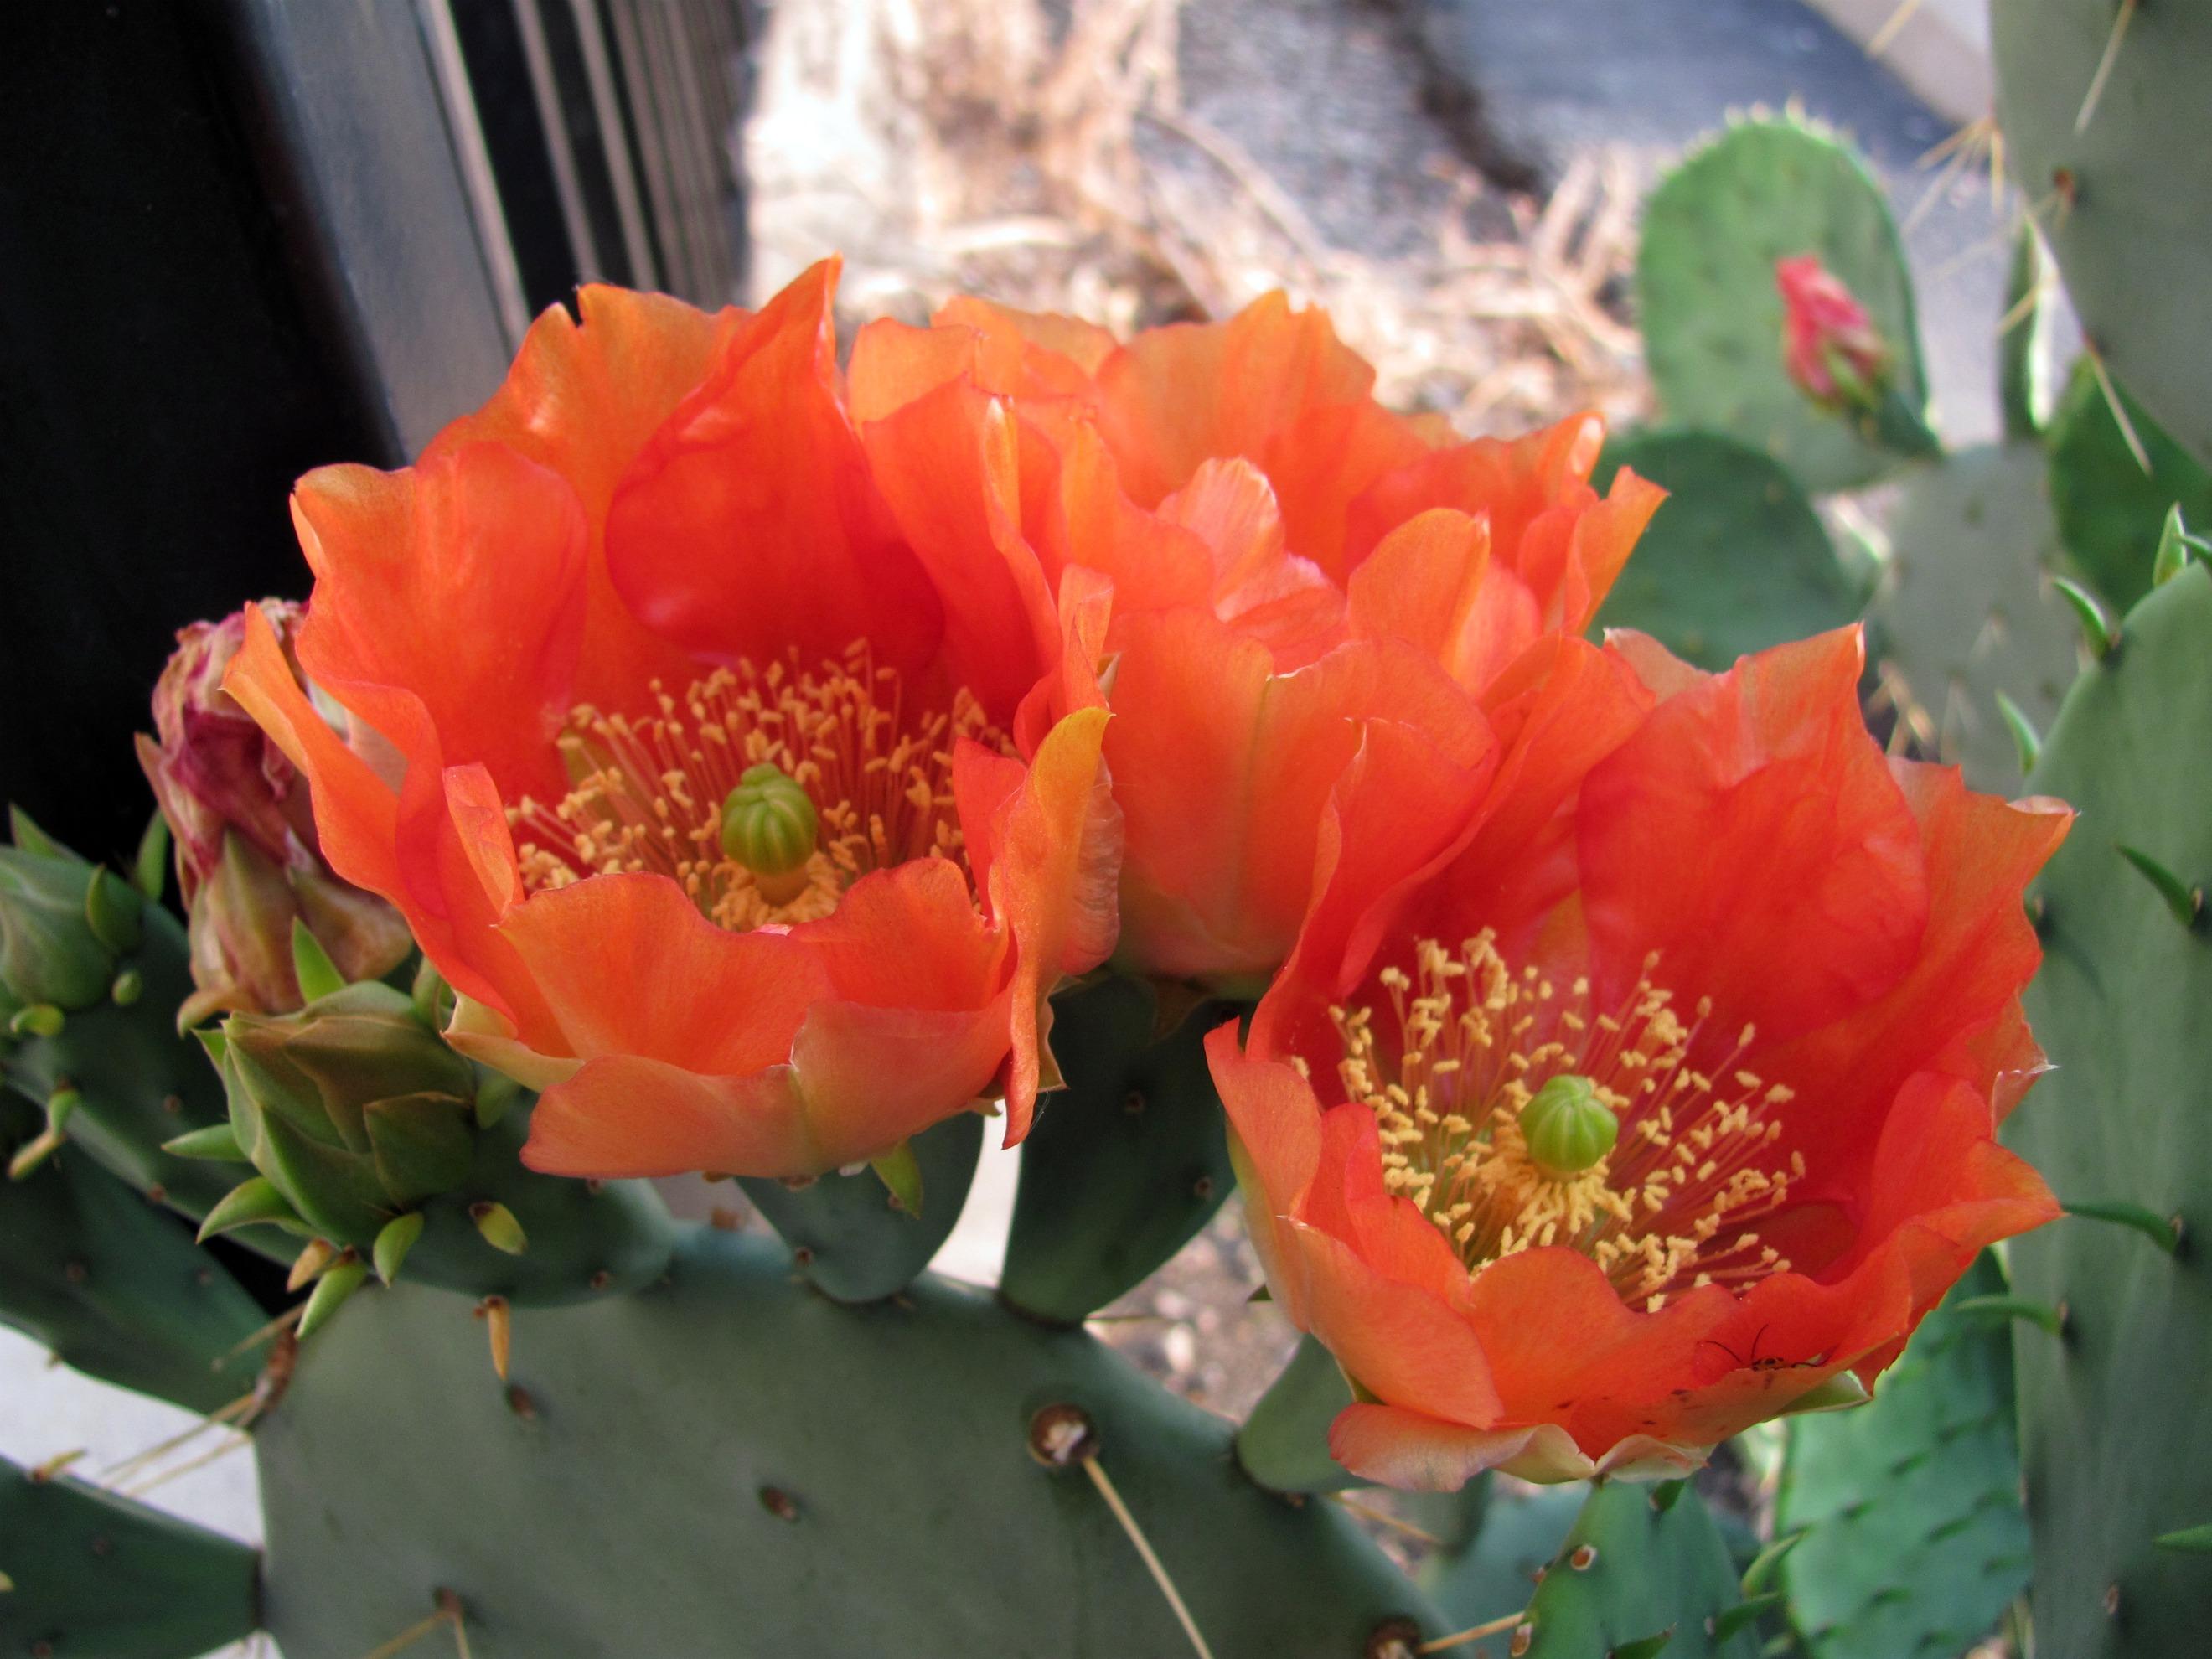 Prickly Pear Flower detail